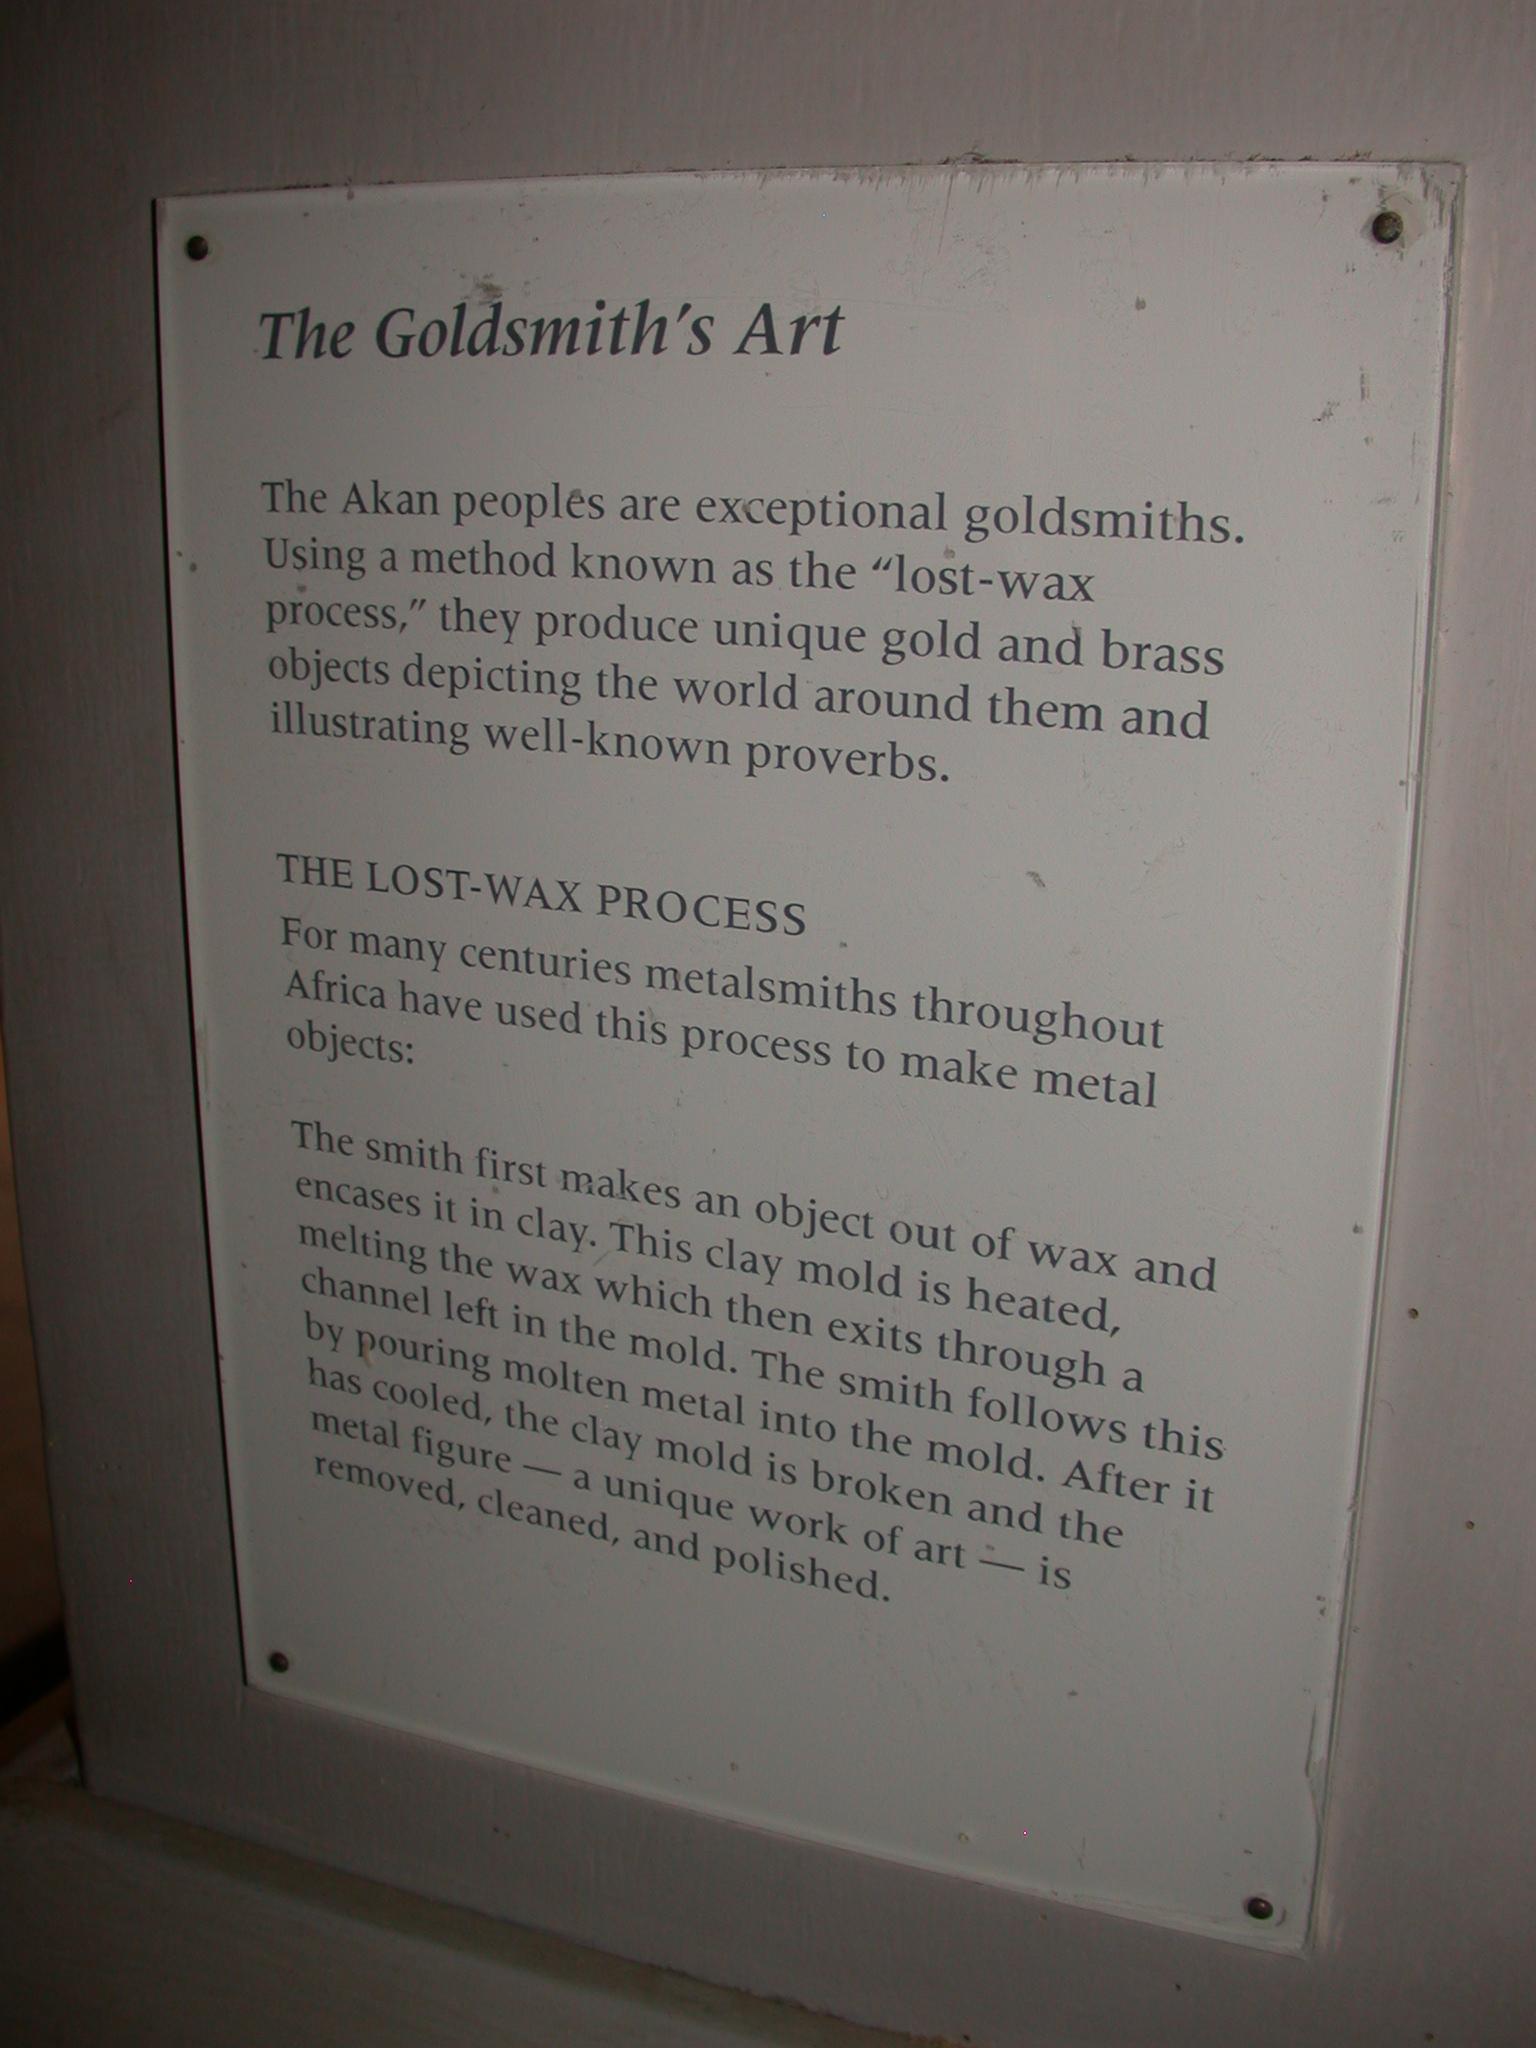 Ghana Gold Lost-Wax Process Description, Cape Coast Slave Fort Museum, Cape Coast, Ghana